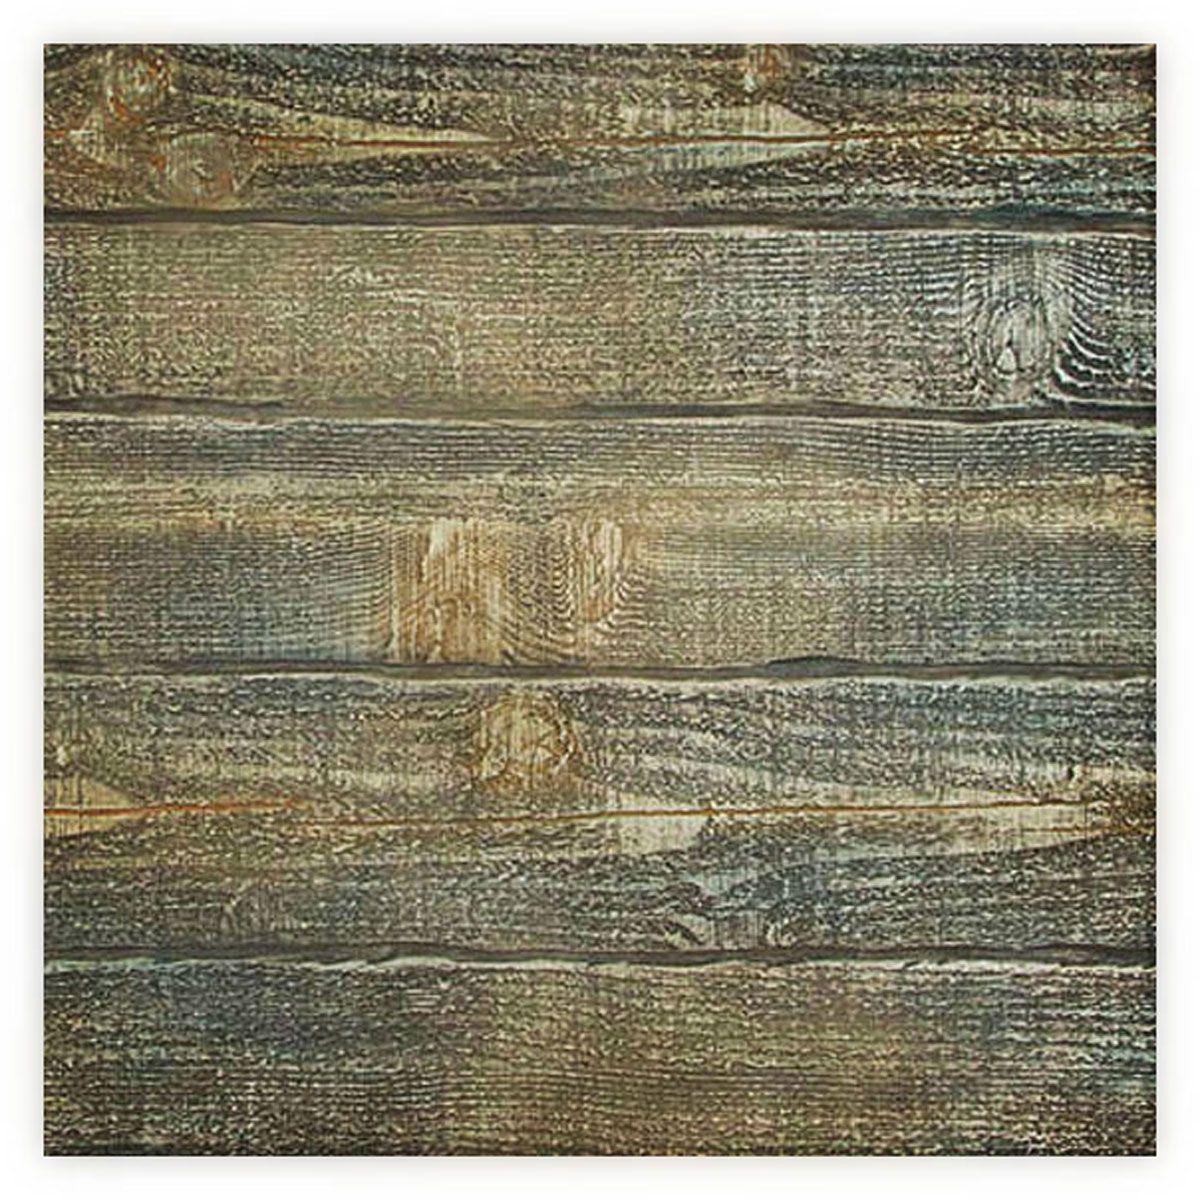 6w X 6h Rough Sawn Endurathane Faux Wood Siding Panel Sample Weathered Blue 19 9900 Wood Panel Siding Wood Vinyl Siding Vinyl Siding